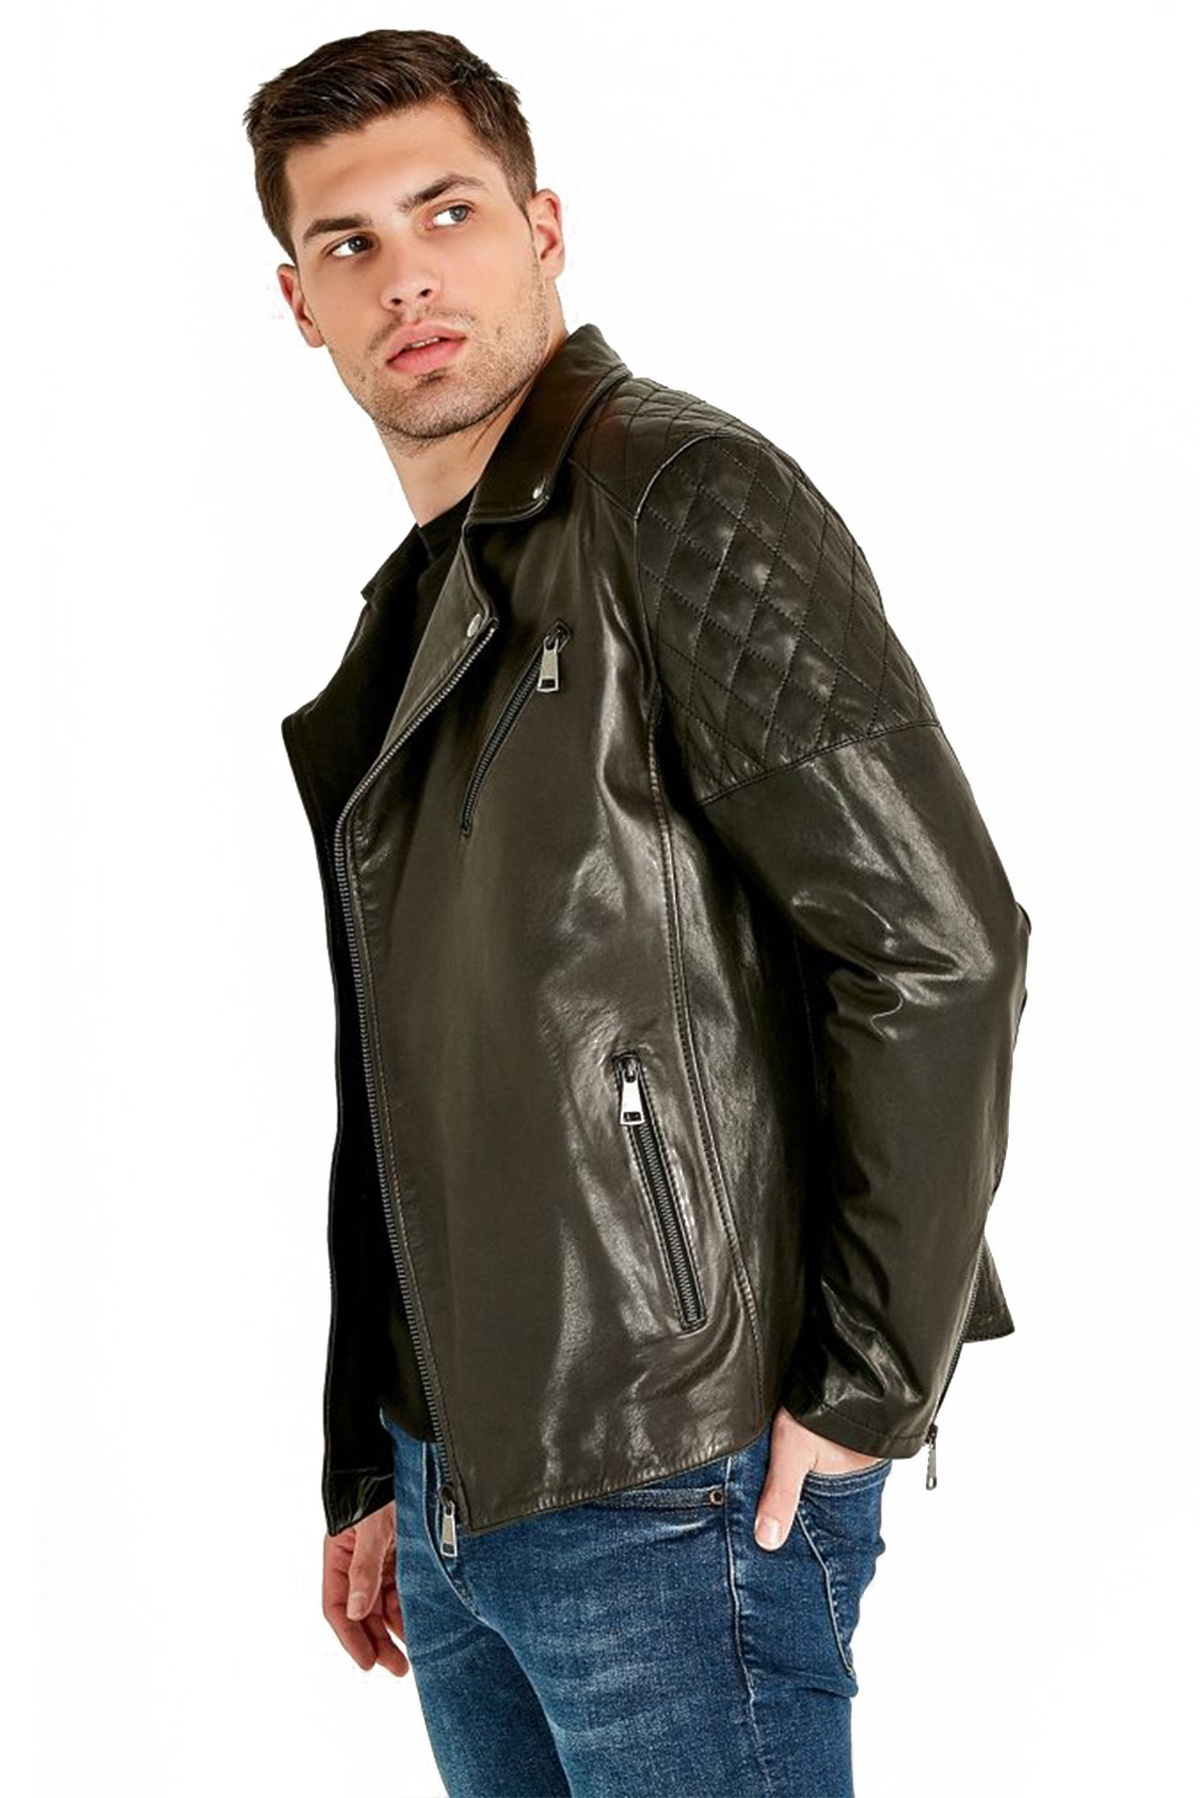 periwinkle leather jacket